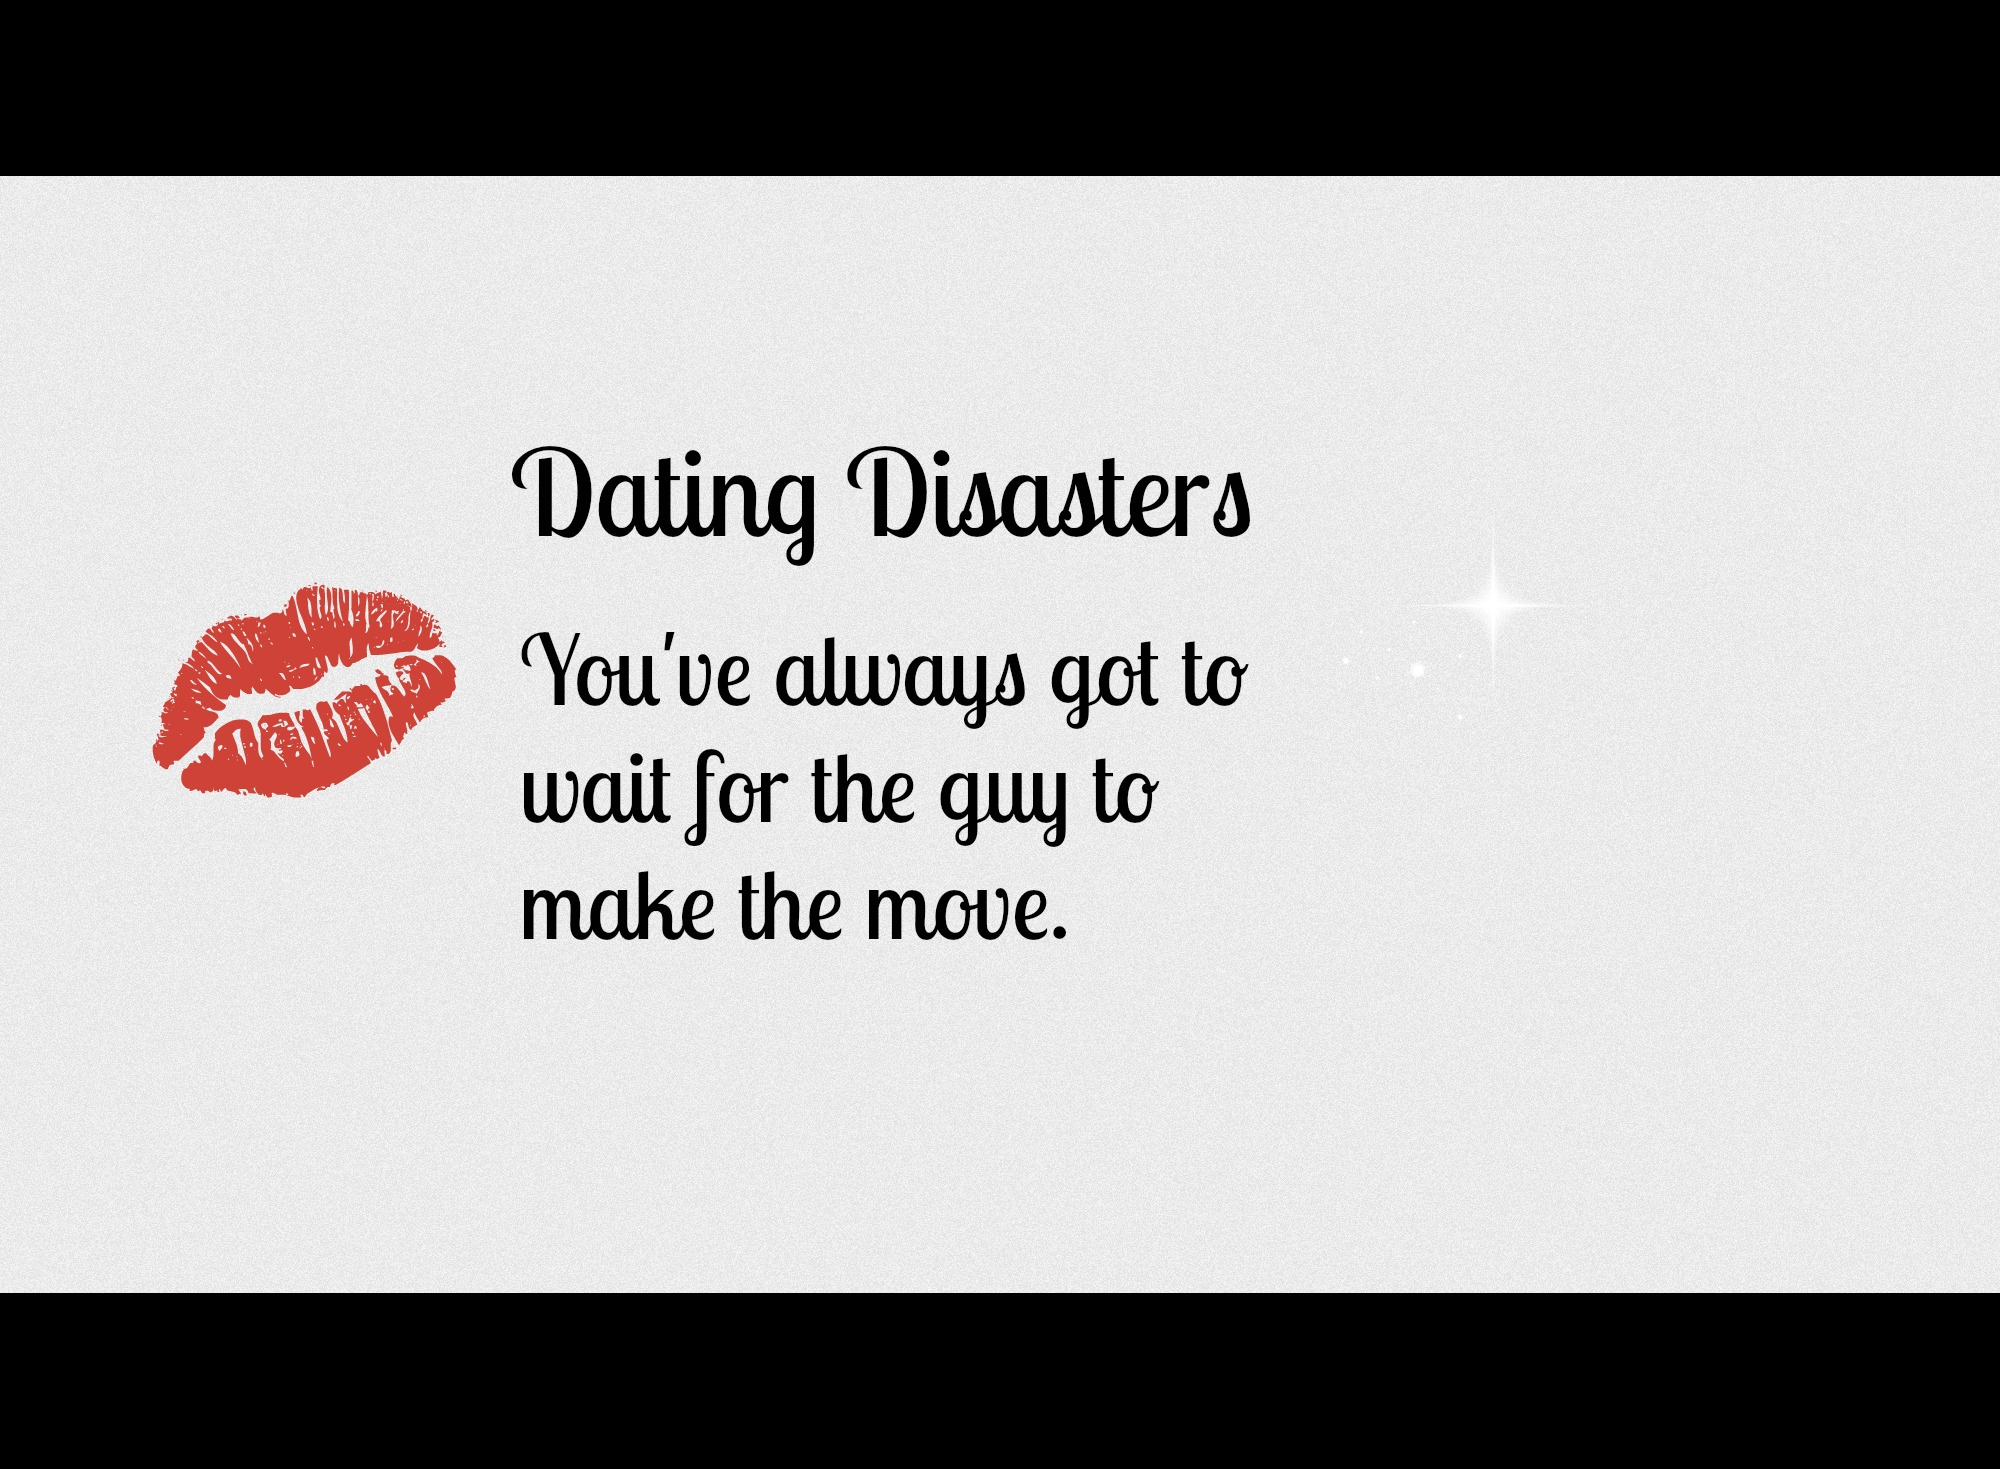 Moderne dating tips